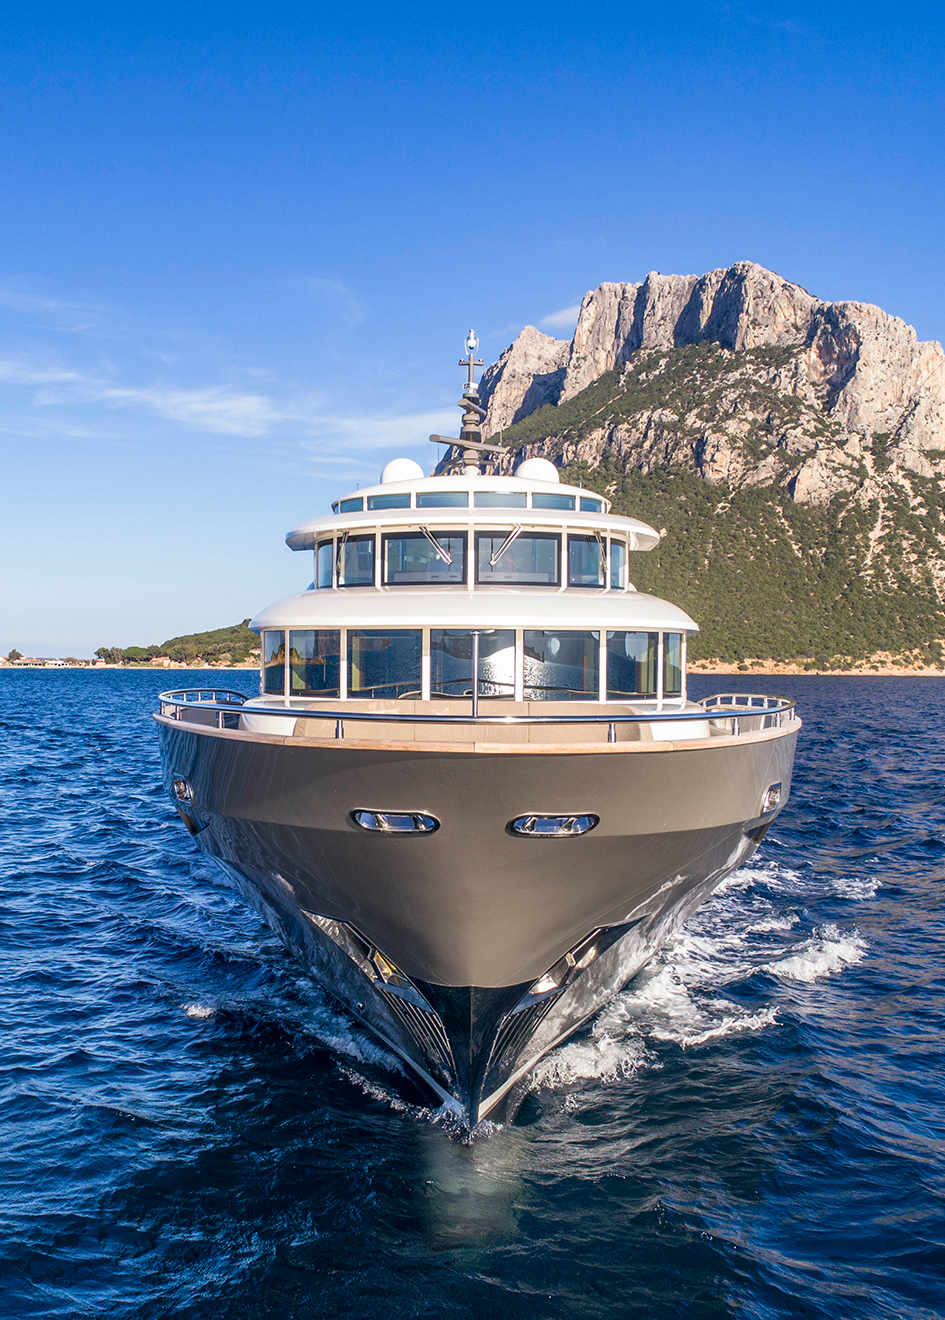 bow-running-shot-of-the-filippetti-navetta-26-yacht-maxima